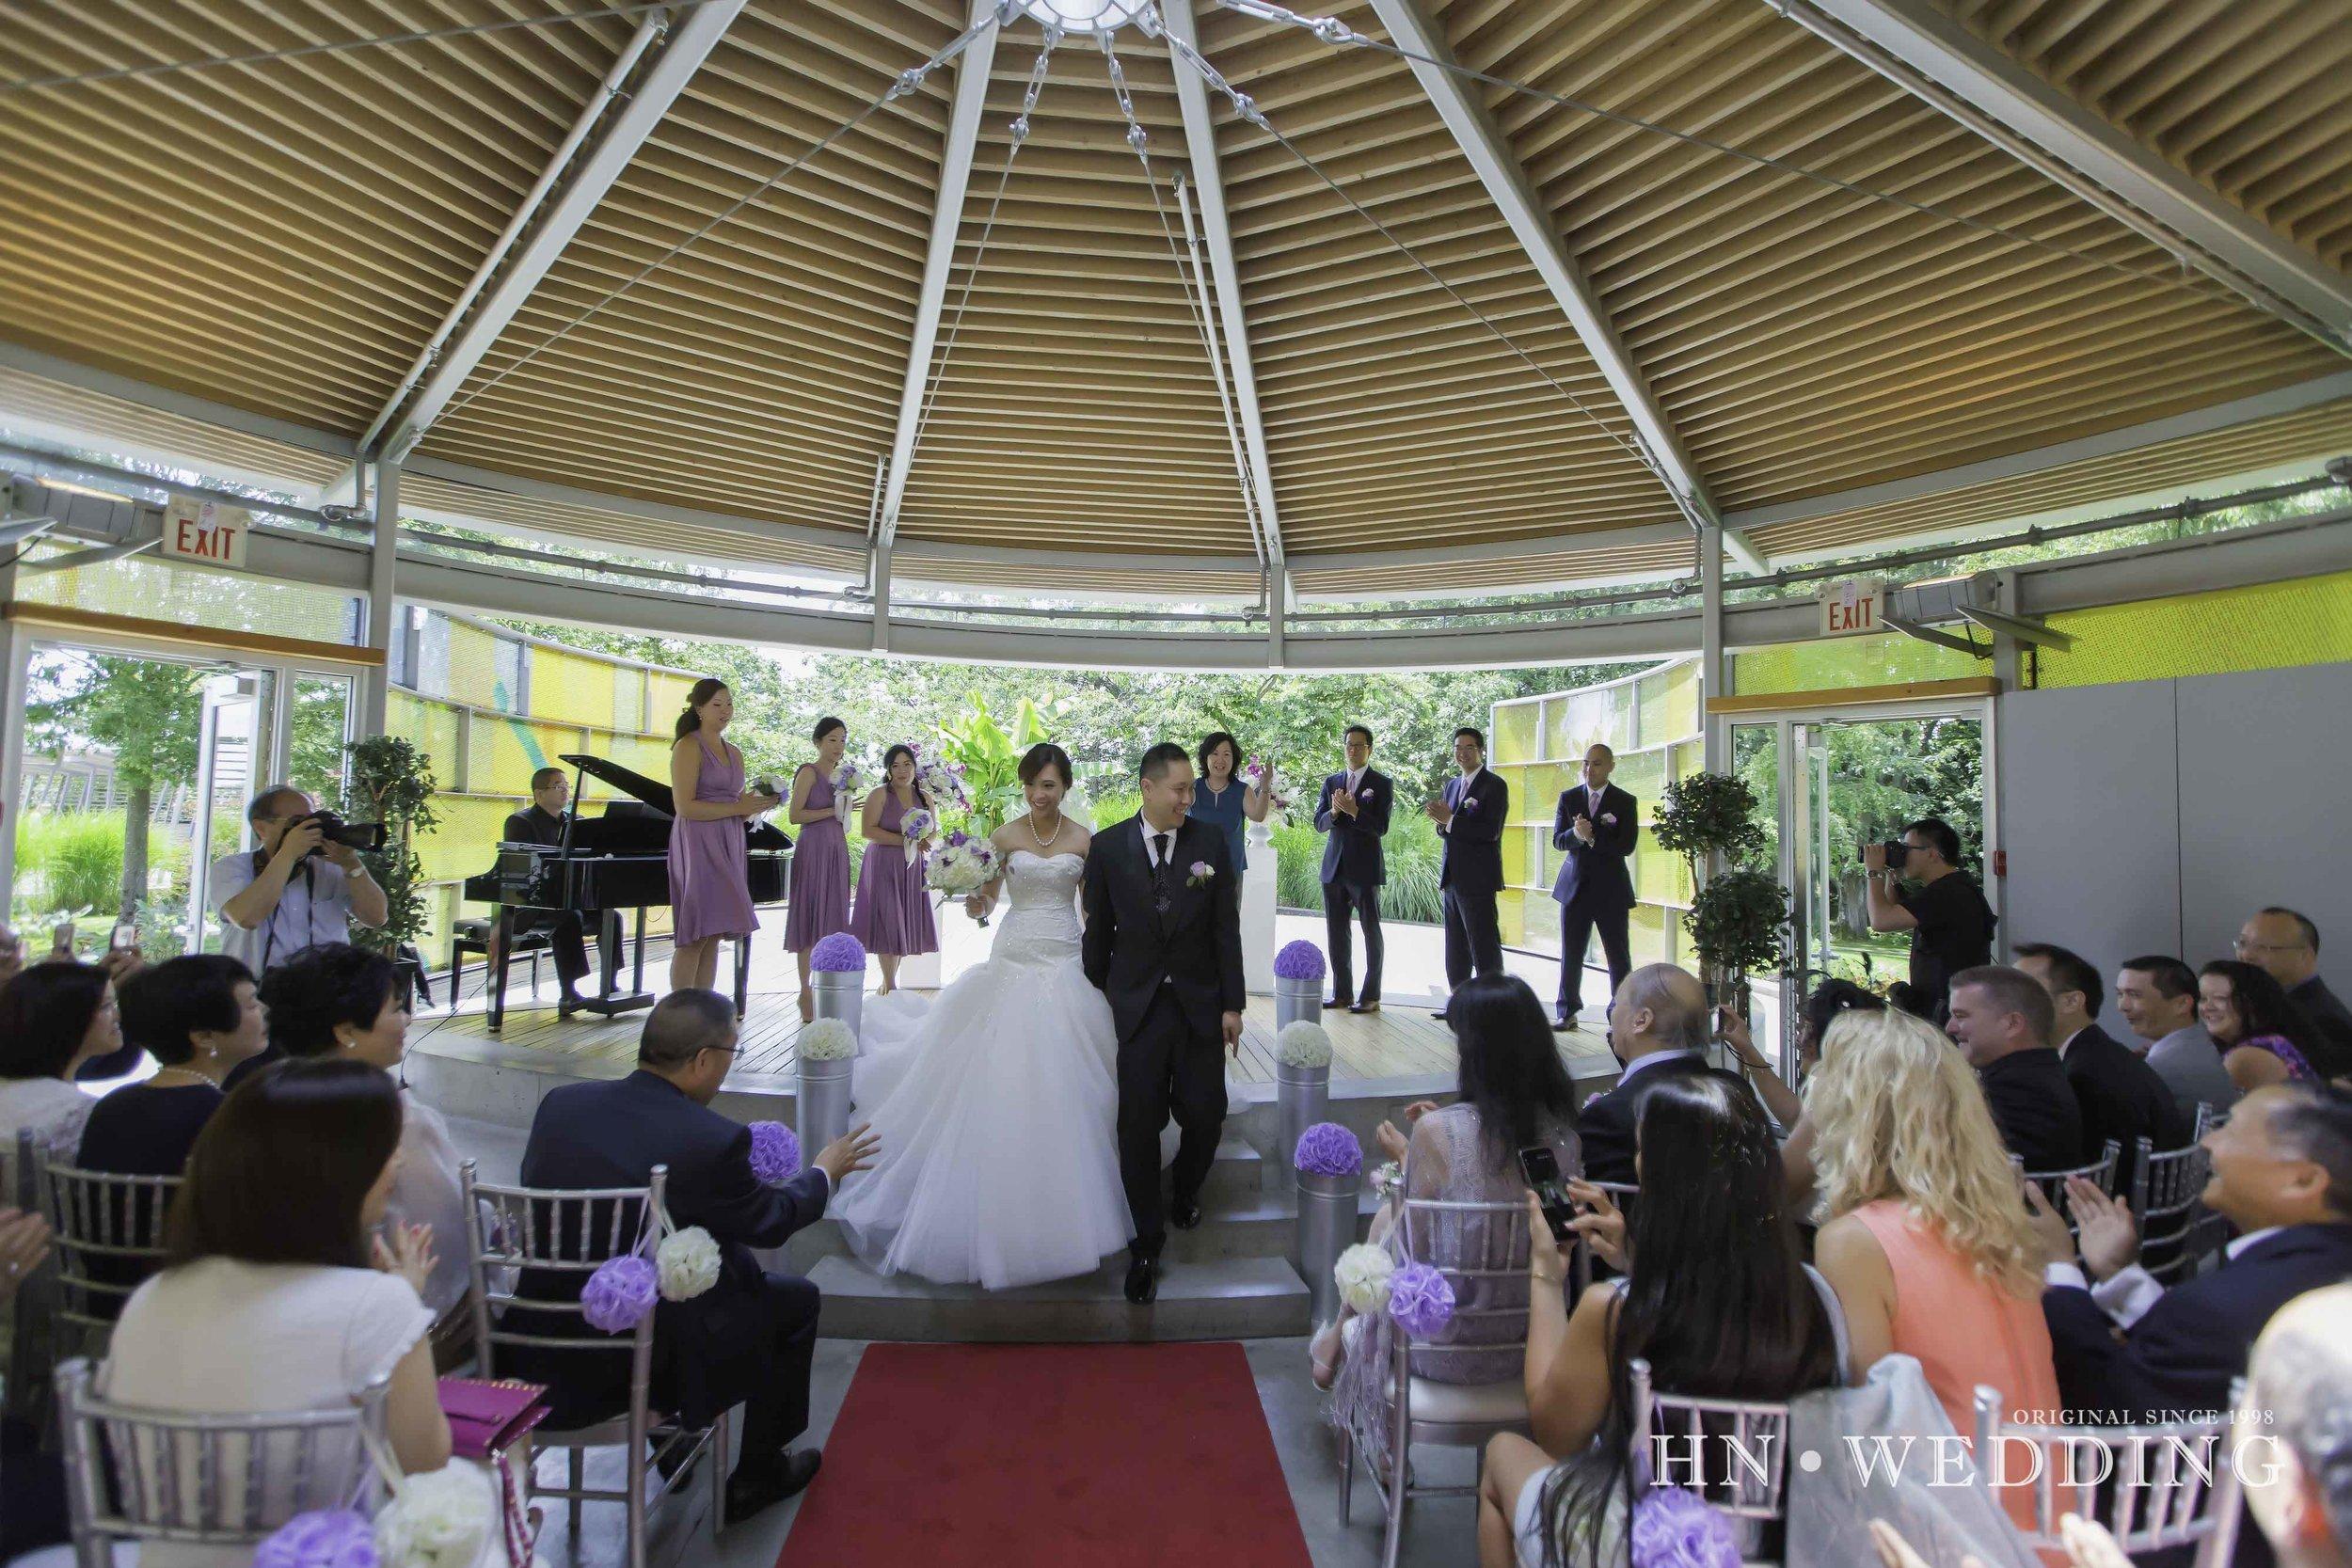 HNwedding-20160822-wedding-6236.jpg